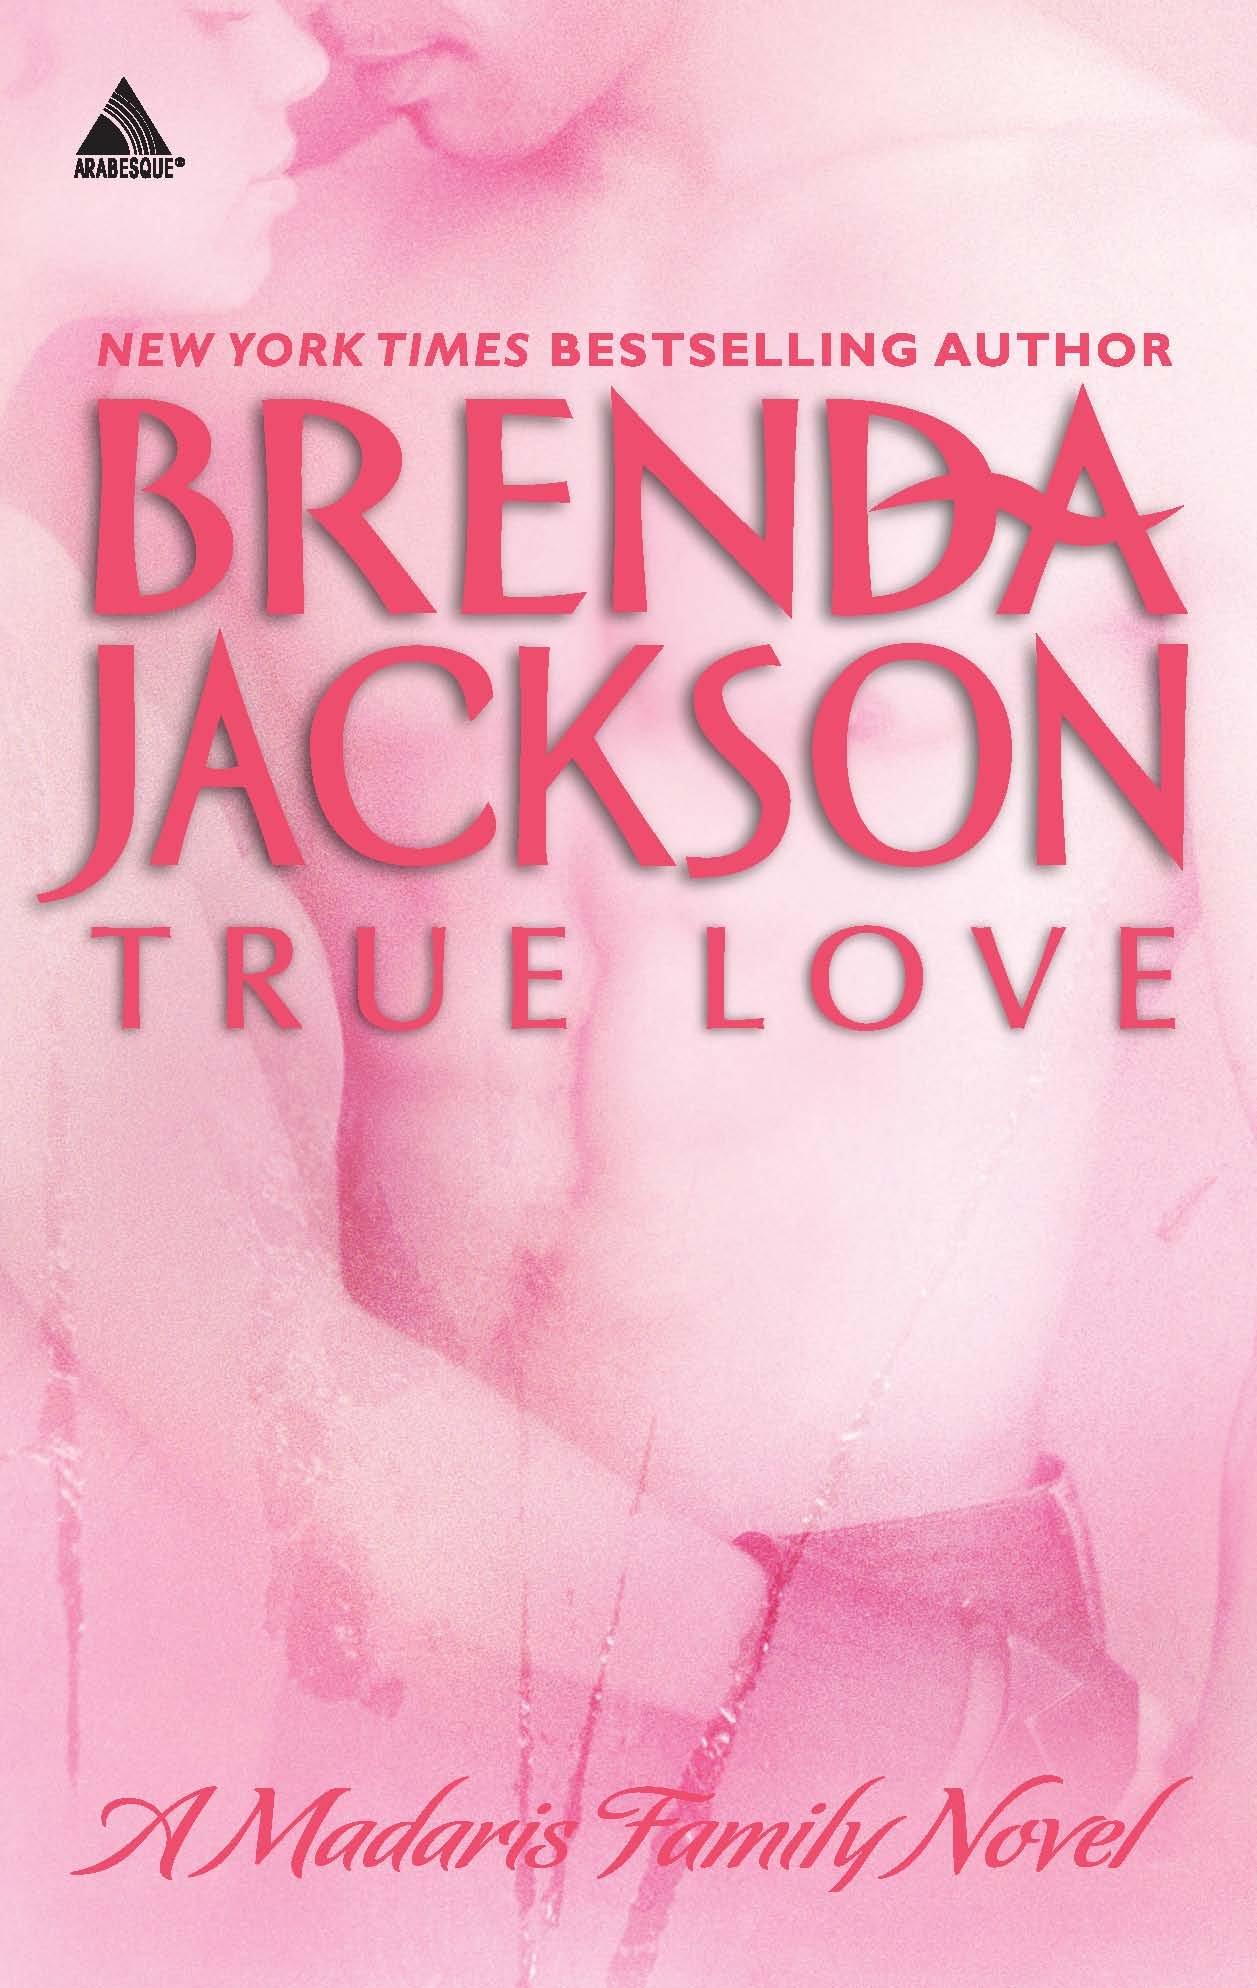 True Love (Madaris Family): Brenda Jackson: 9780373831272: Amazon.com: Books